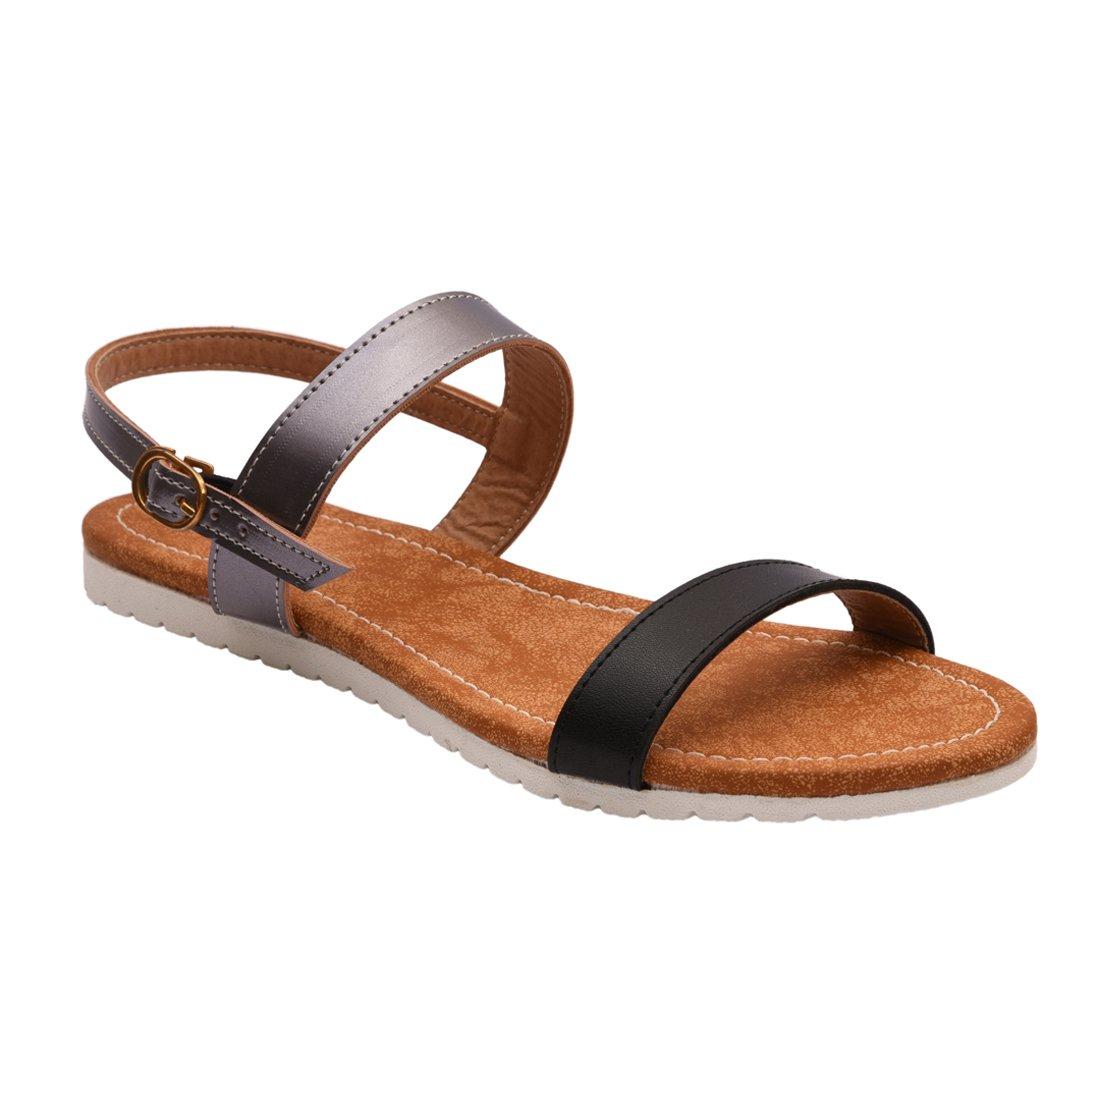 1f796170267f3 meriggiare Ladies Casual Flat Slingback Strap Sandals for Women